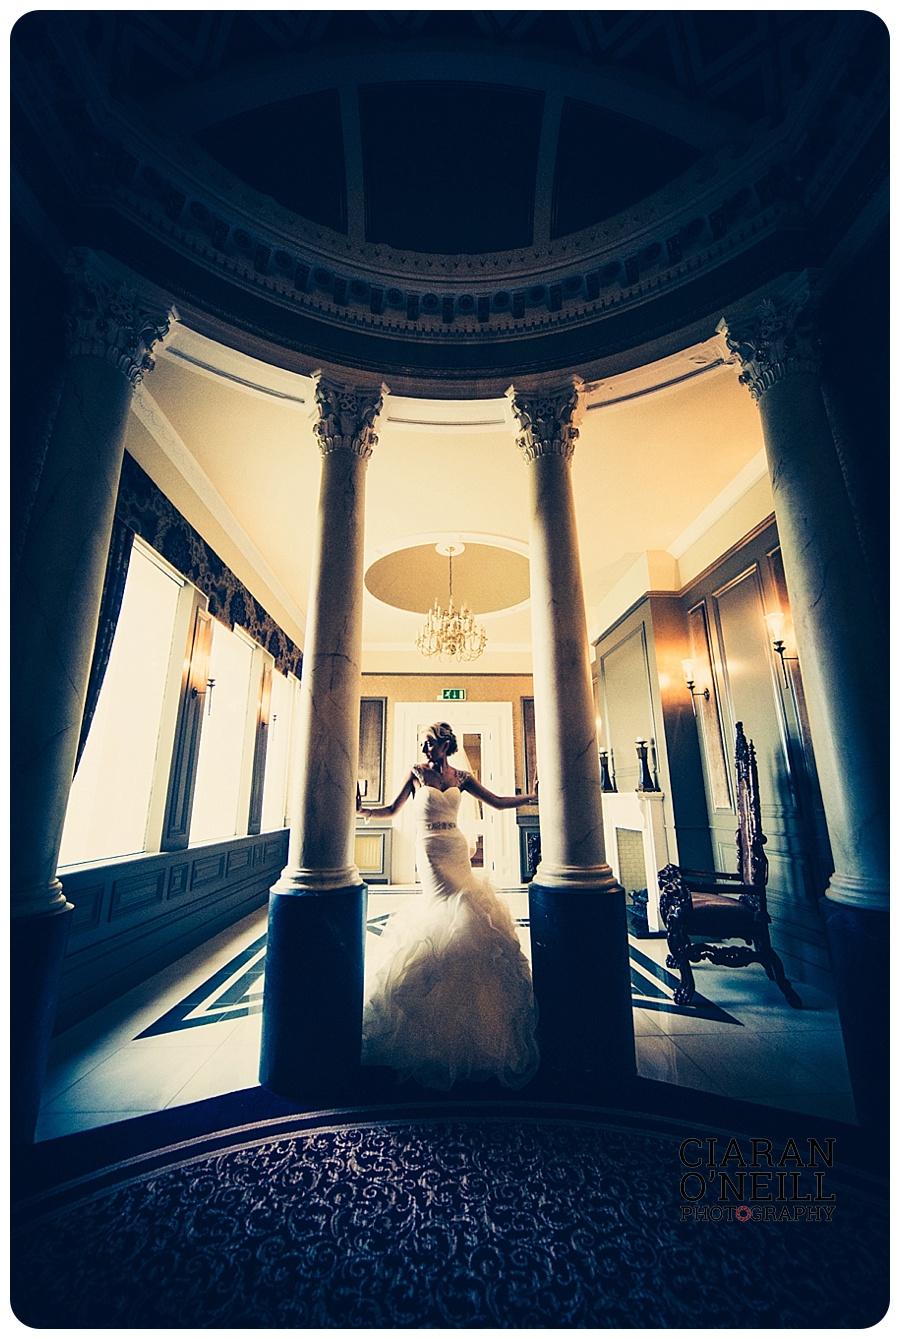 Helen & Glenn's wedding at the Manor House Hotel by Ciaran O'Neill Photography 54